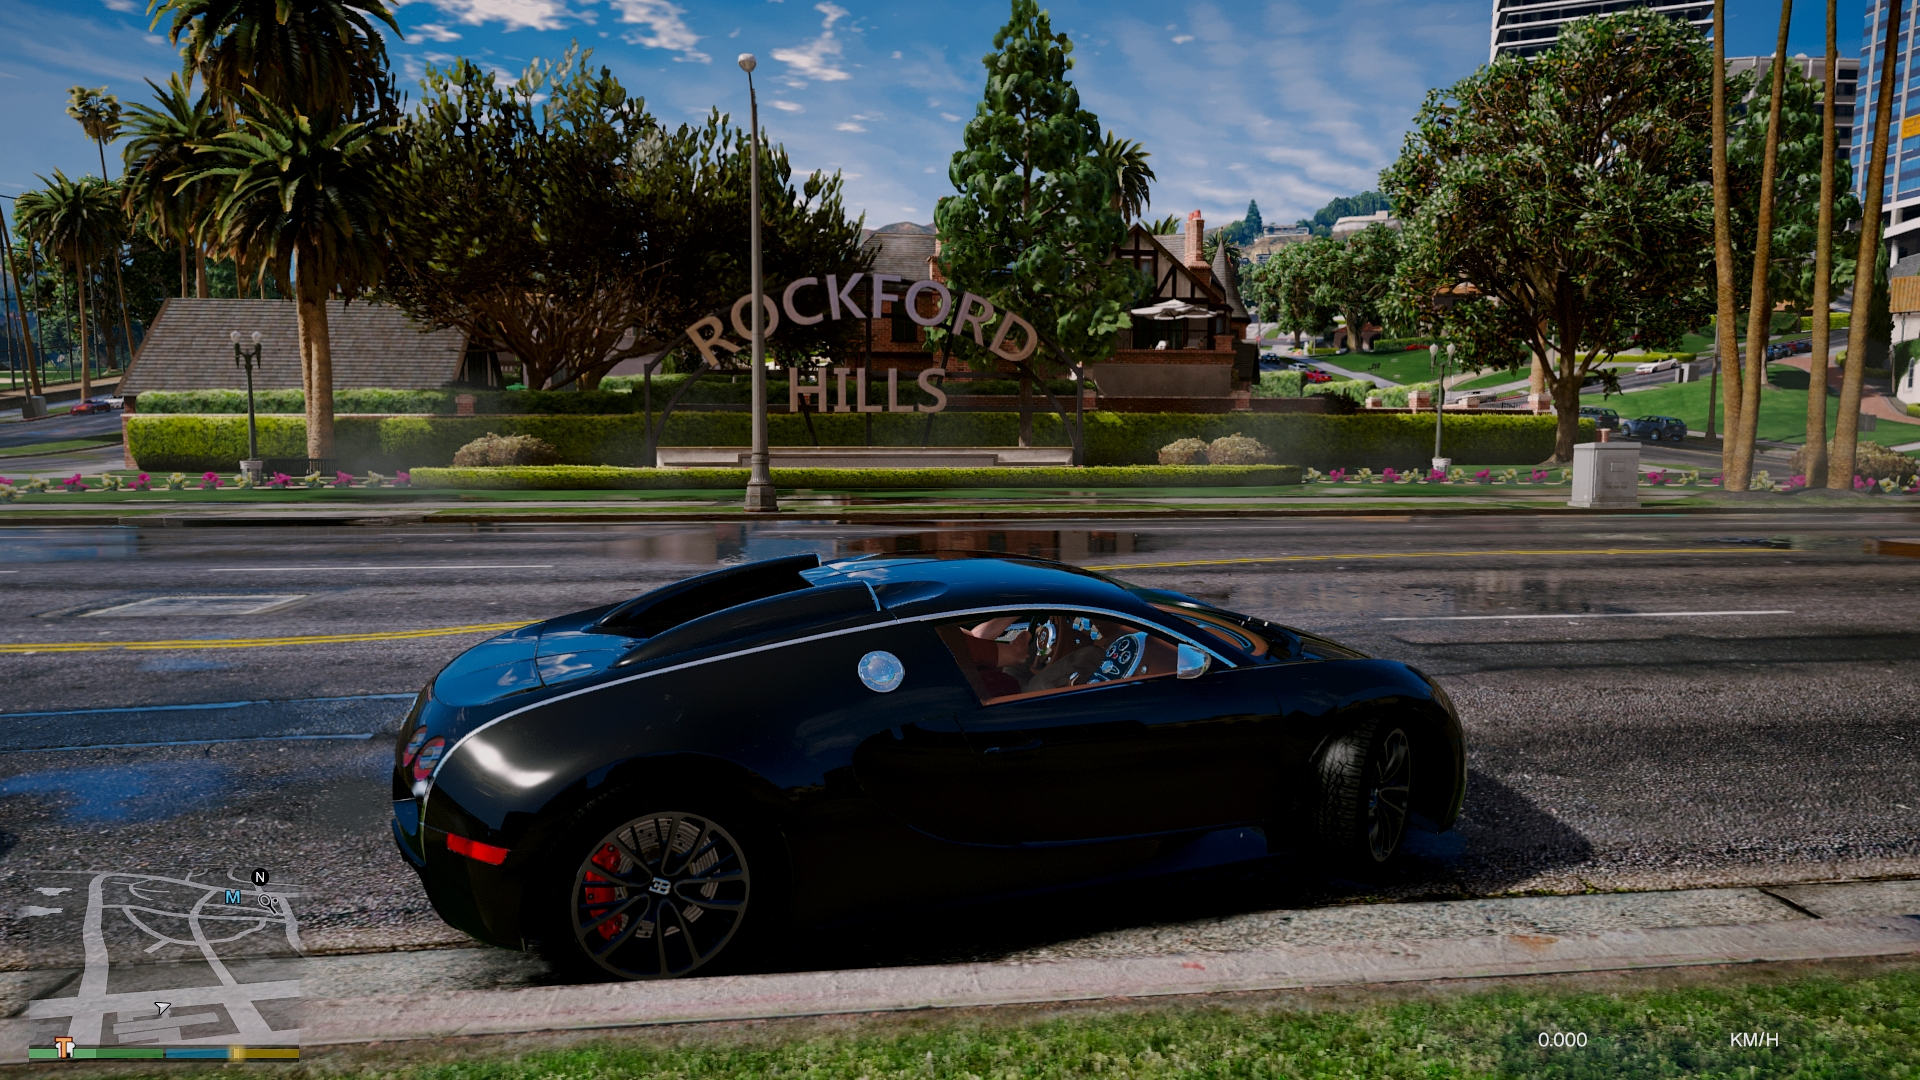 GTA5_2017_05_04_15_37_22_805.jpg - Grand Theft Auto 5